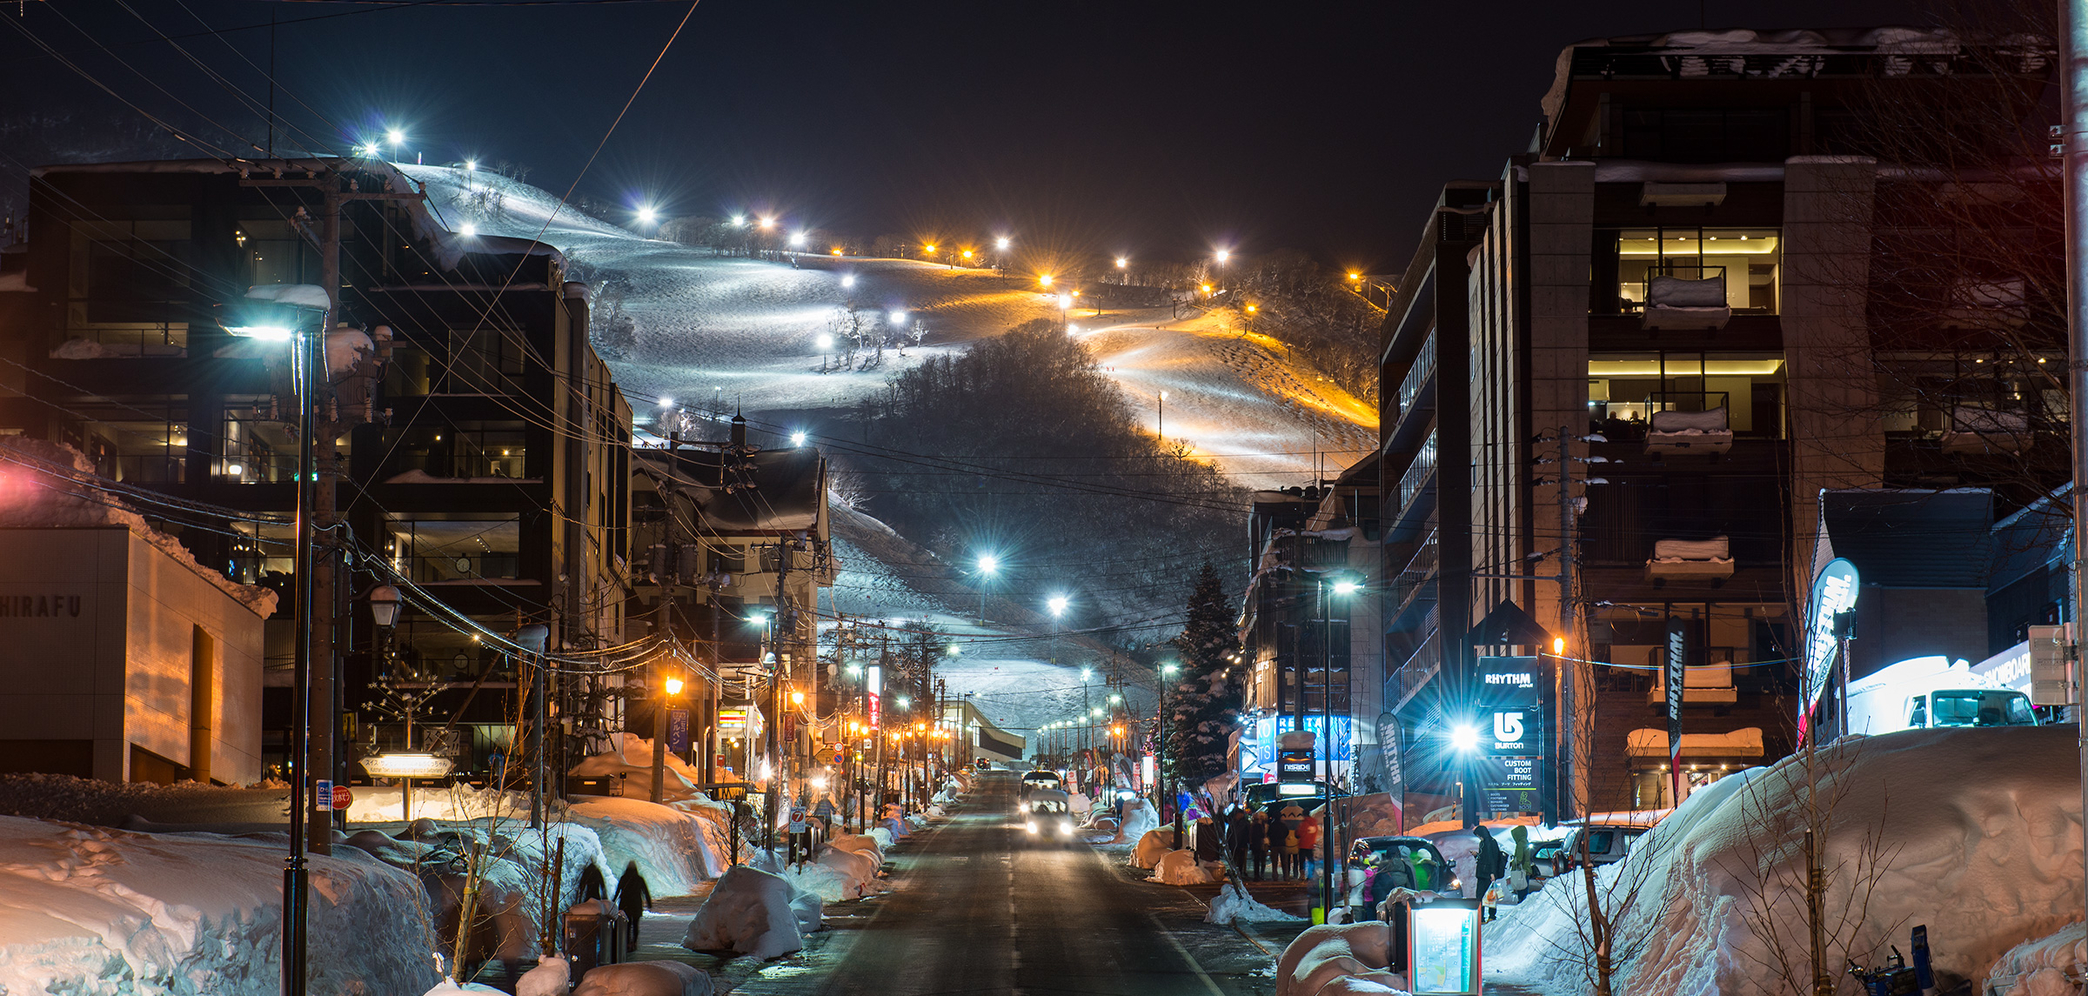 6 Of The Best Bars In Niseko Skimax Holidays